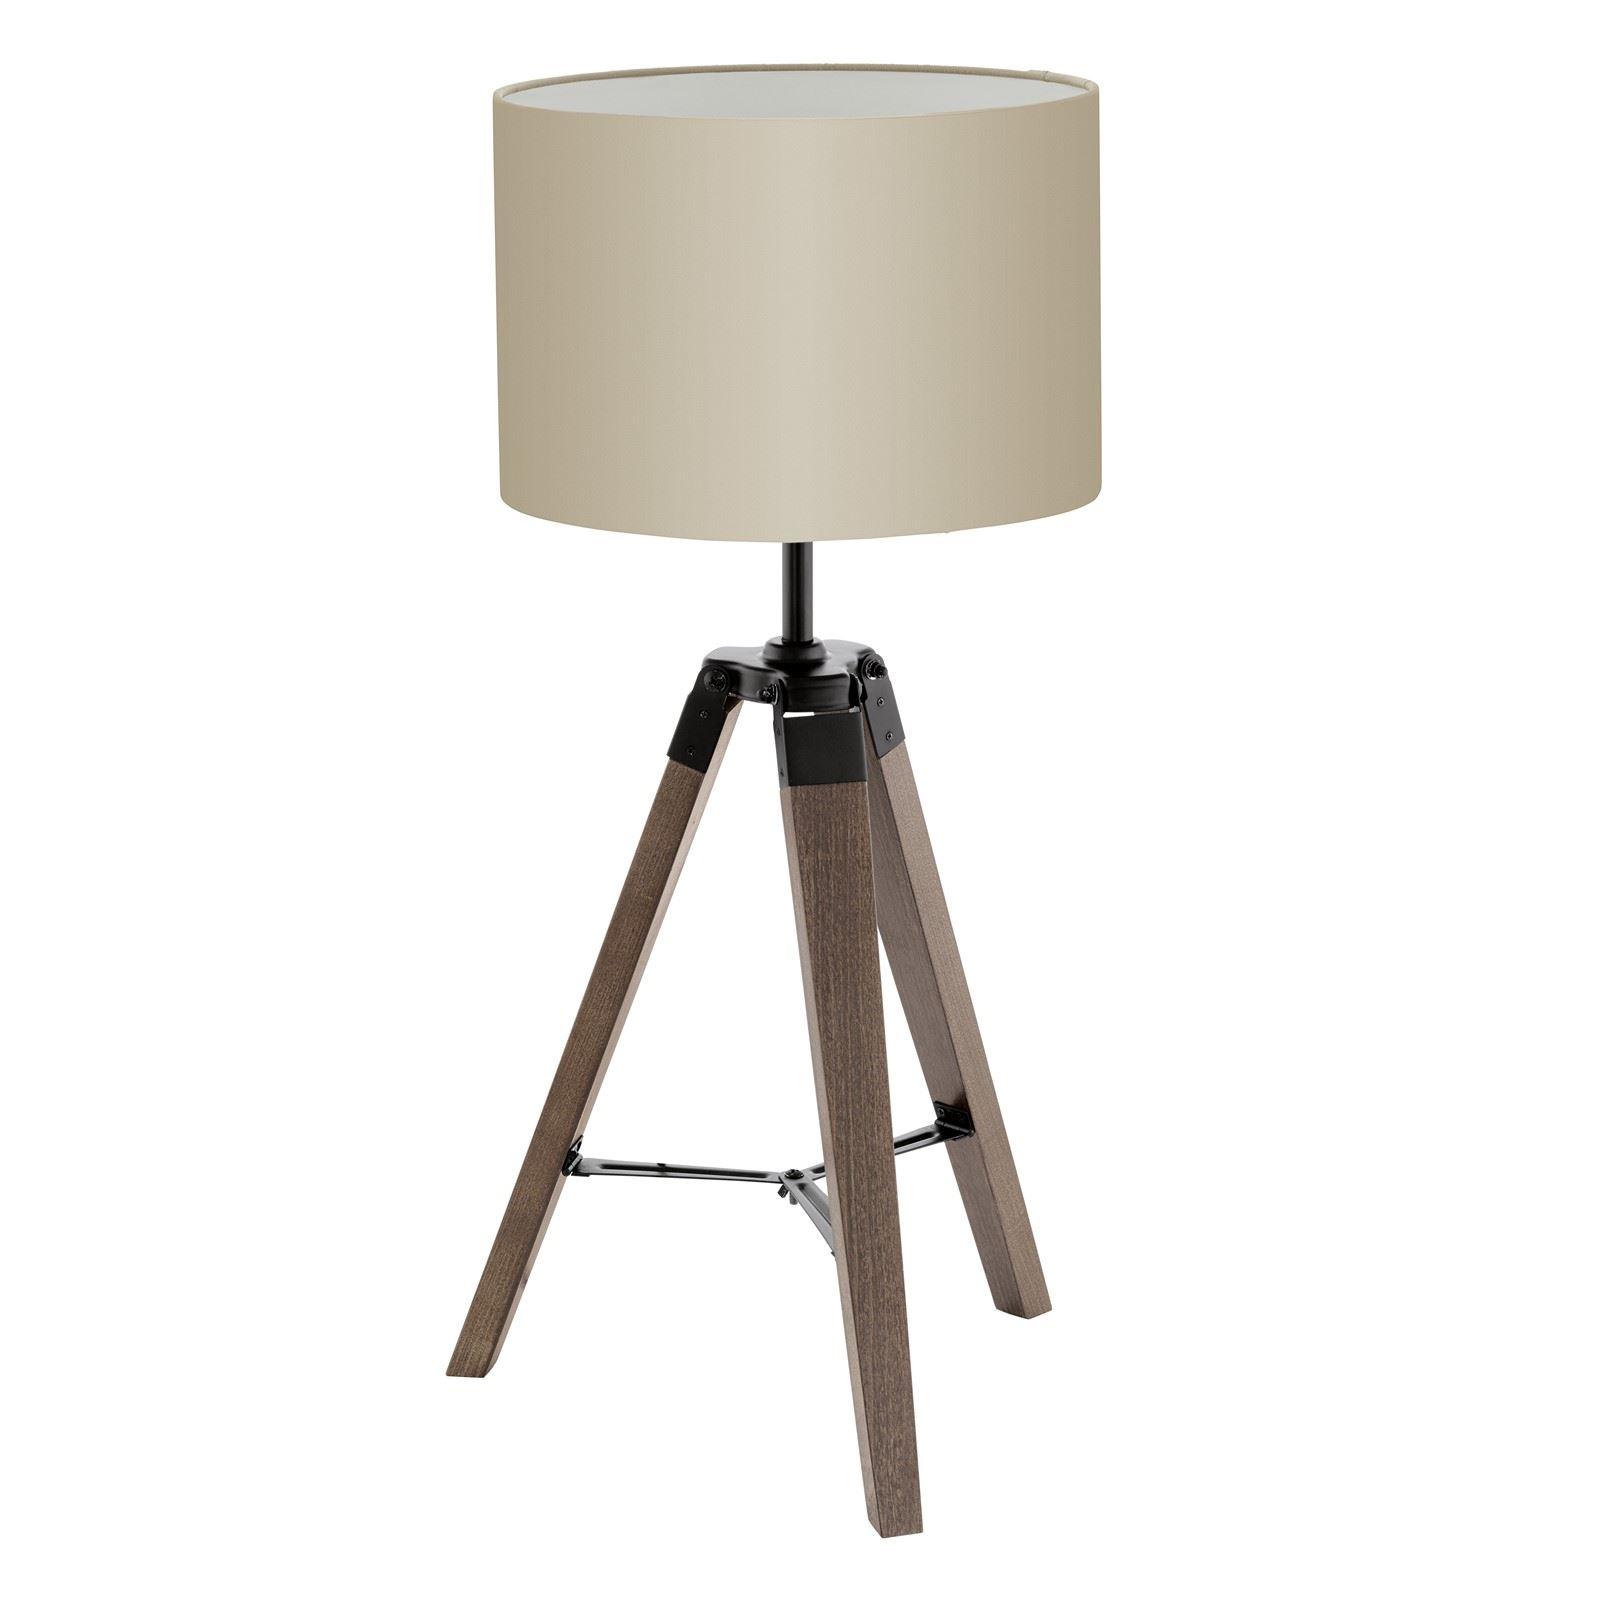 Lantada Wood Steel Table Lamp 1 Light Taupe Fabric Shade